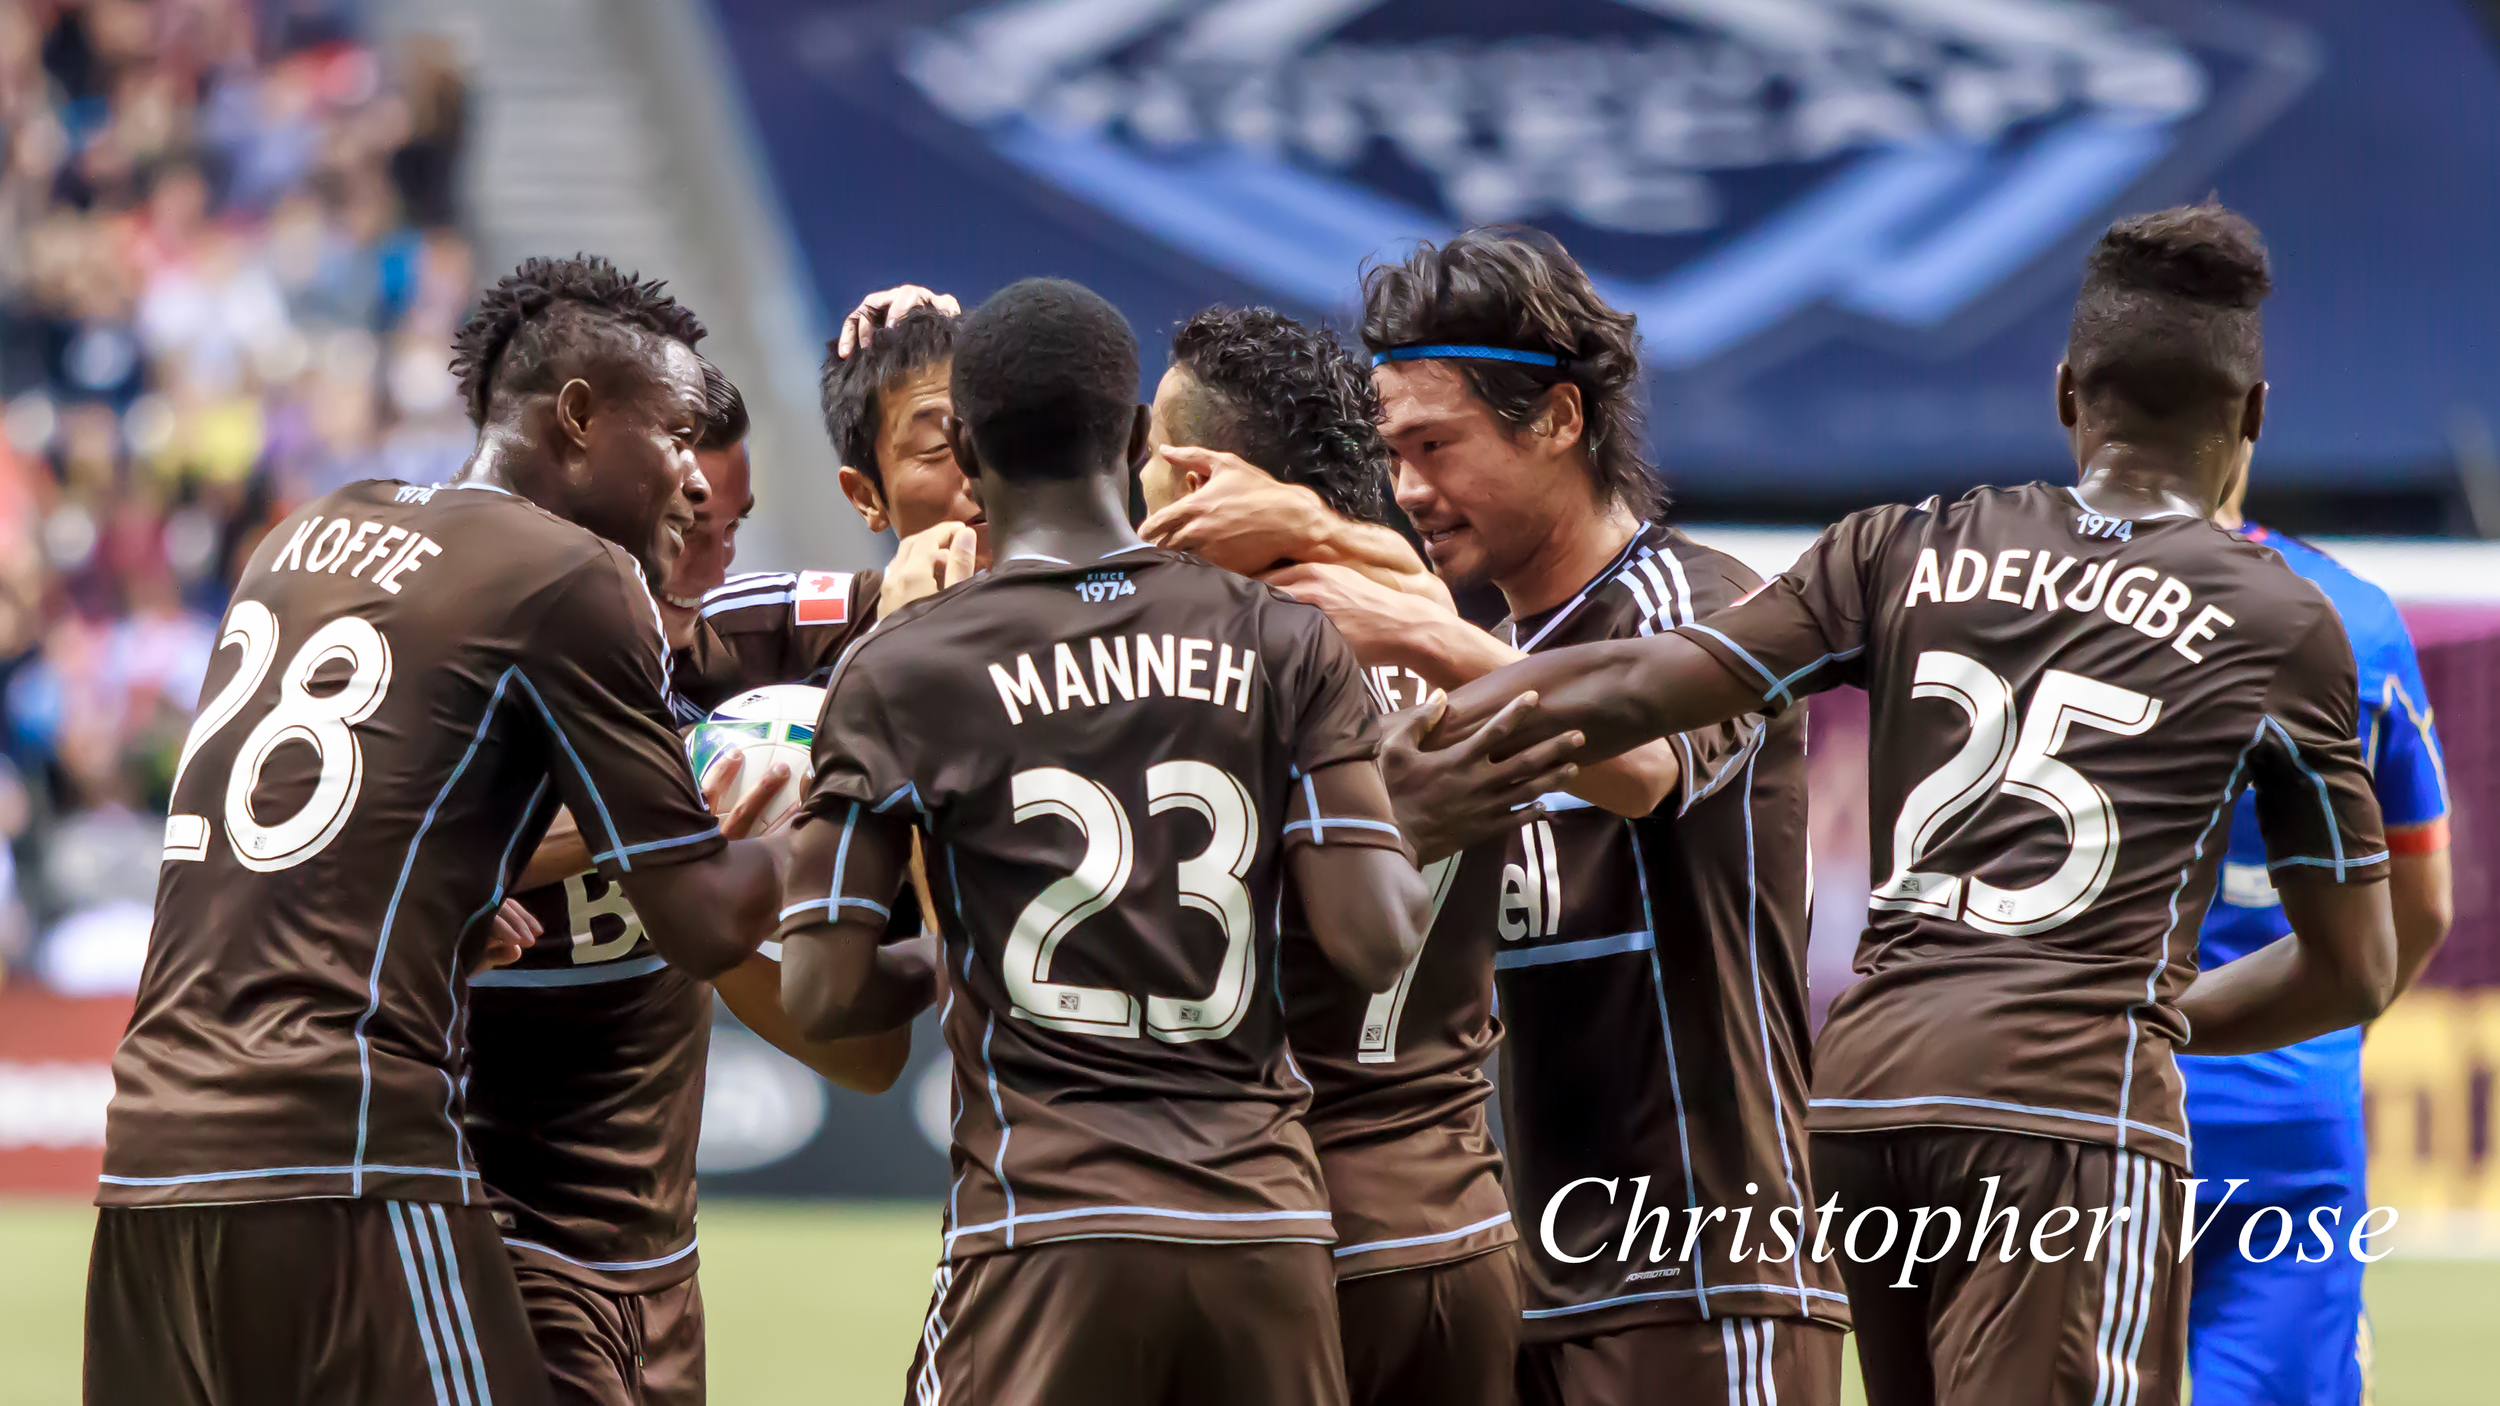 2013-10-27 Camilo Sanvezzo's First Goal Celebration 3.jpg